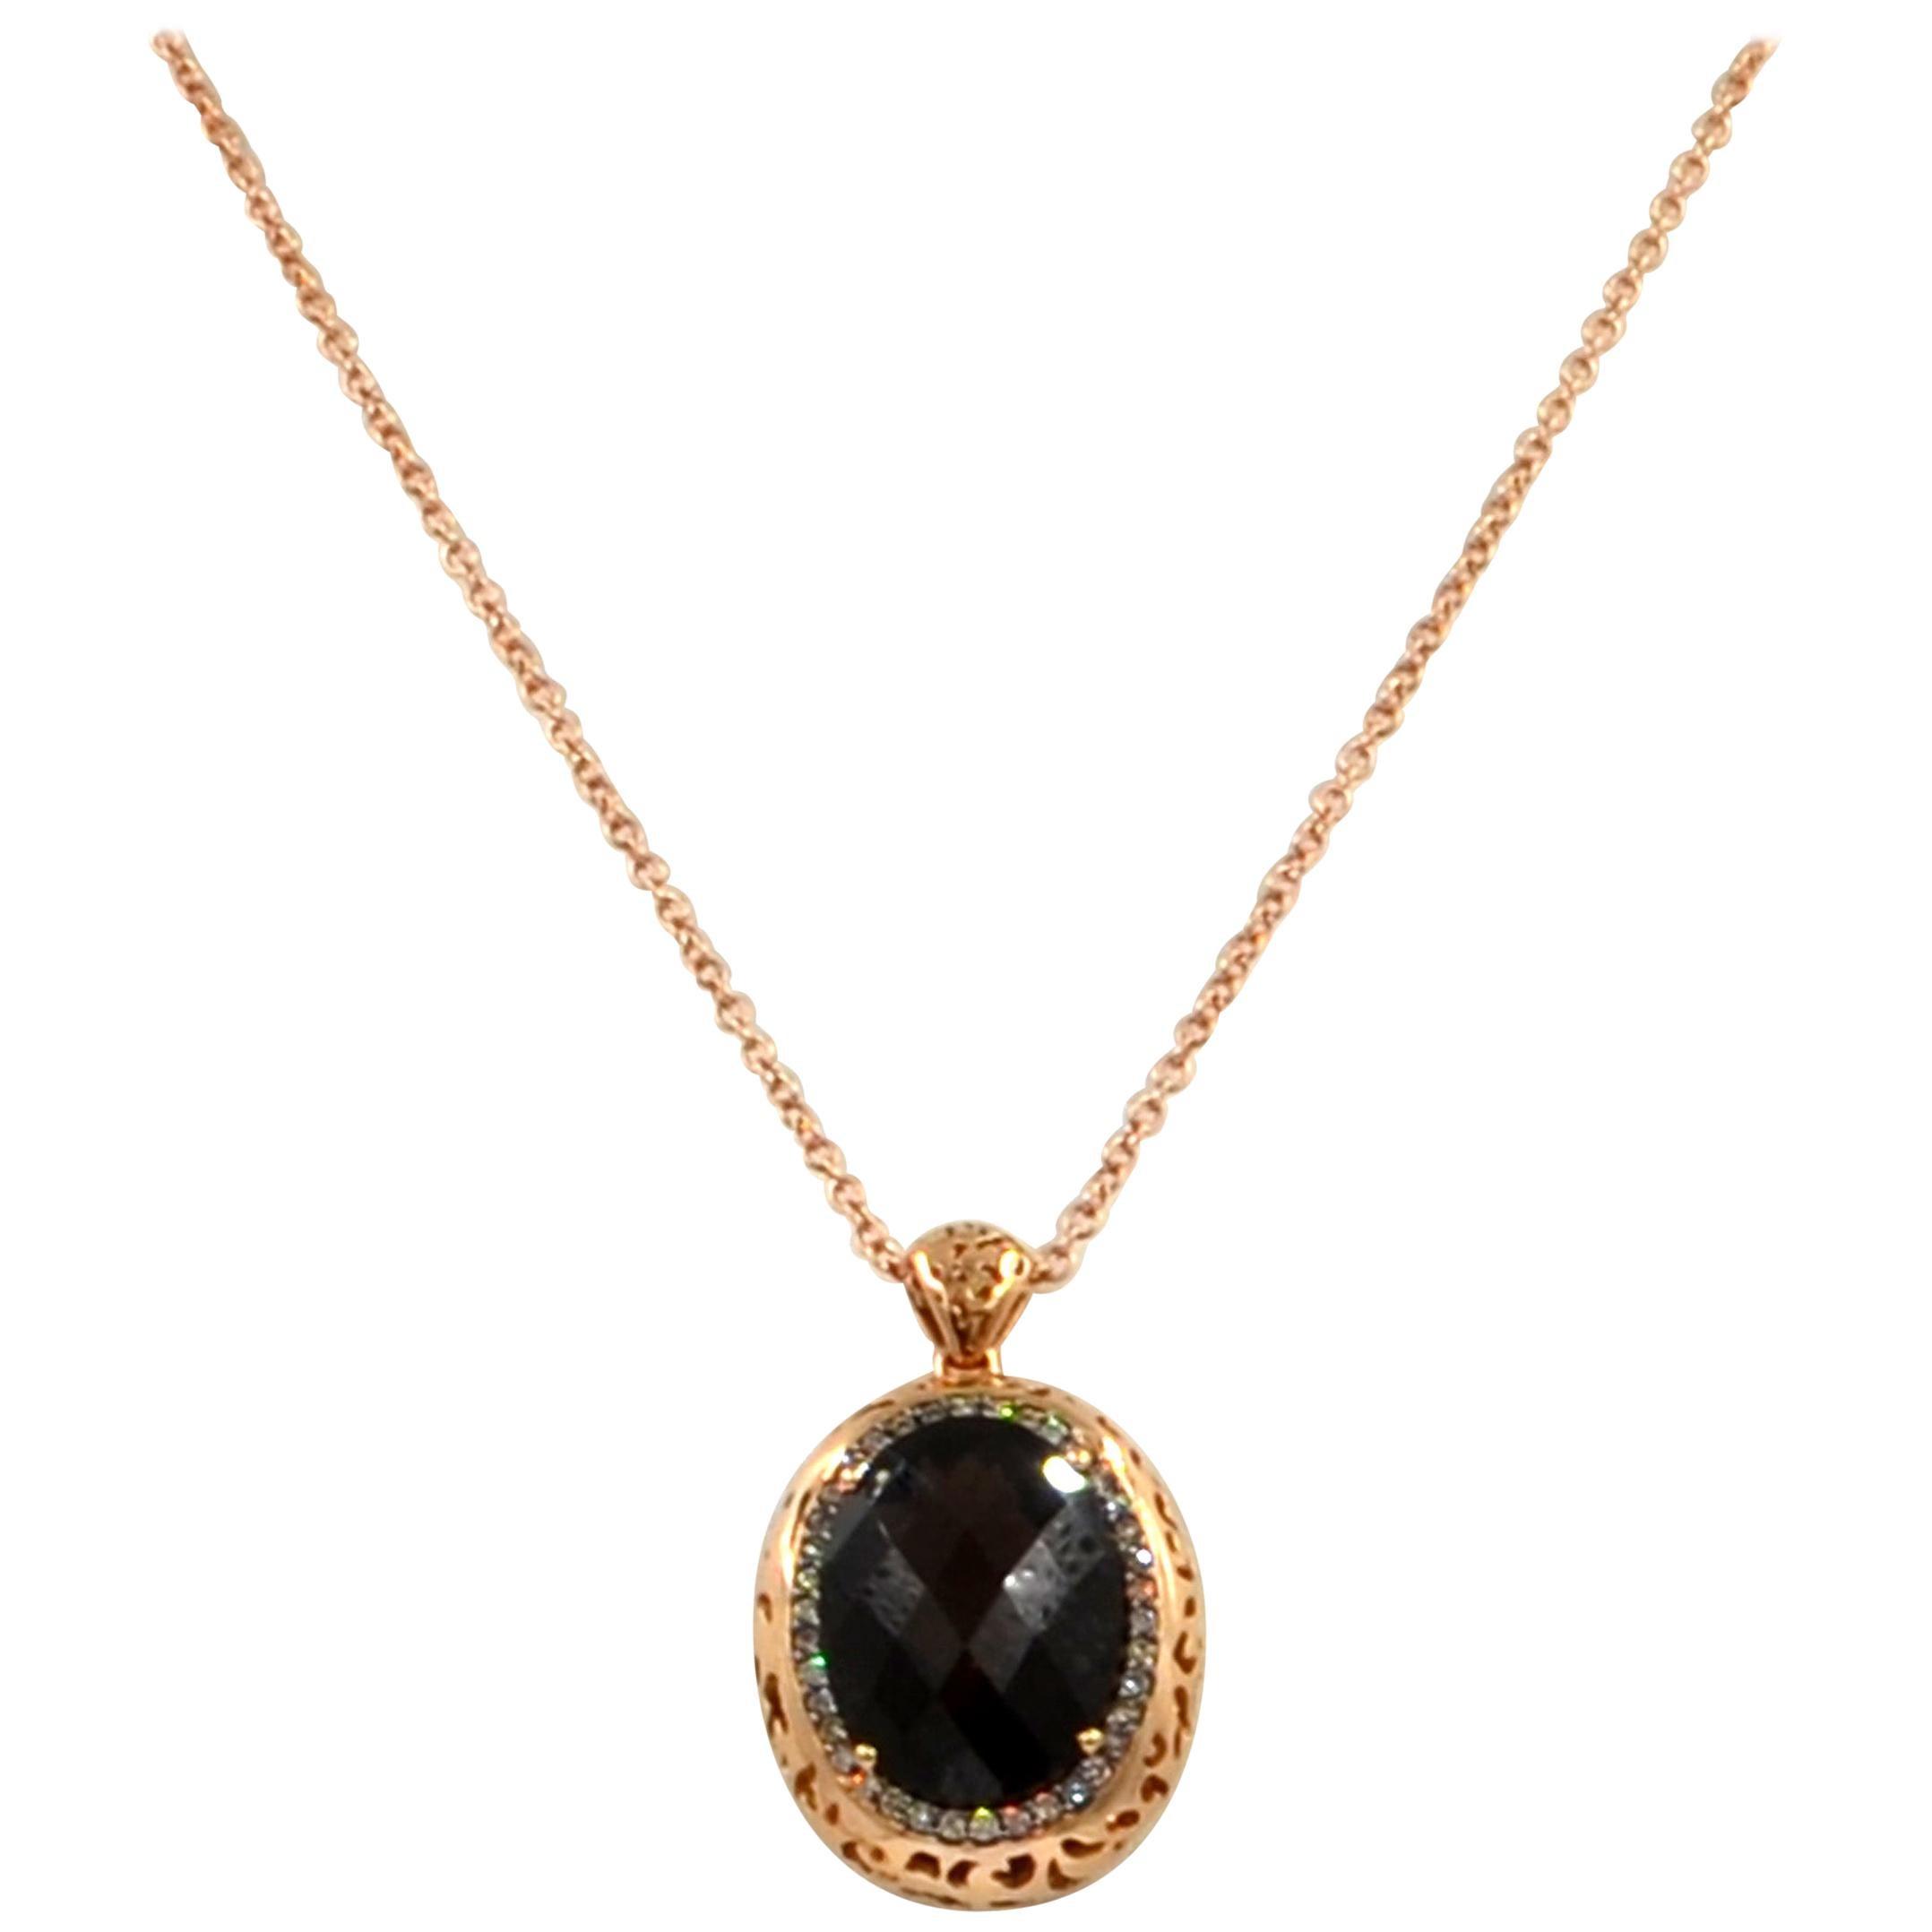 18 Karat Gold Smoky Quartz and Brown Diamonds Garavelli Pendant with Chain